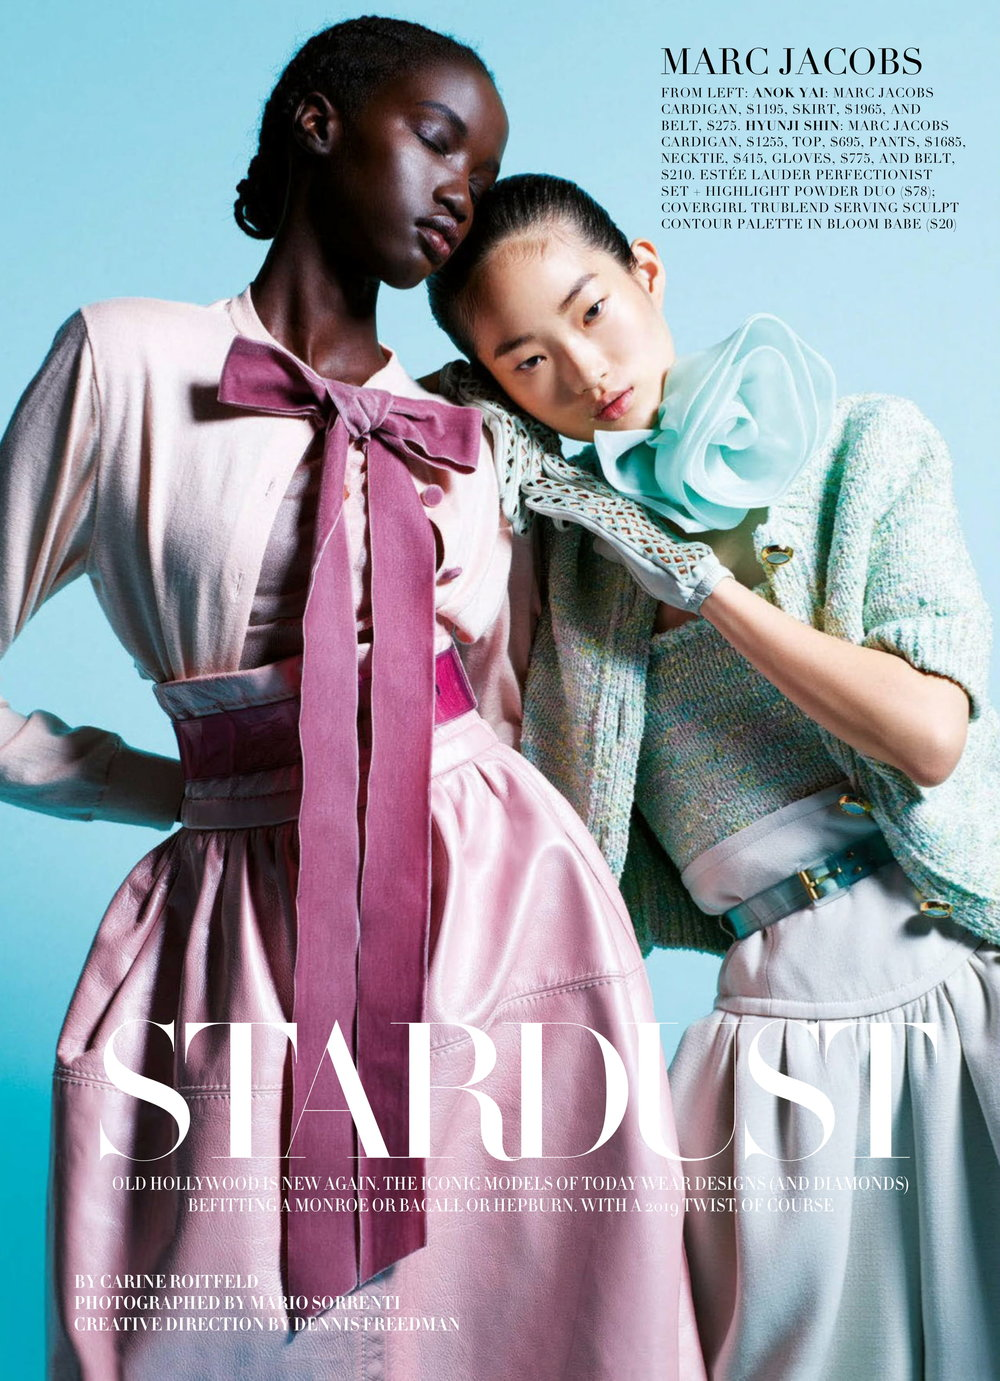 Mario Sorrenti for Harper's Bazaar Australia March 2019 (12).jpg